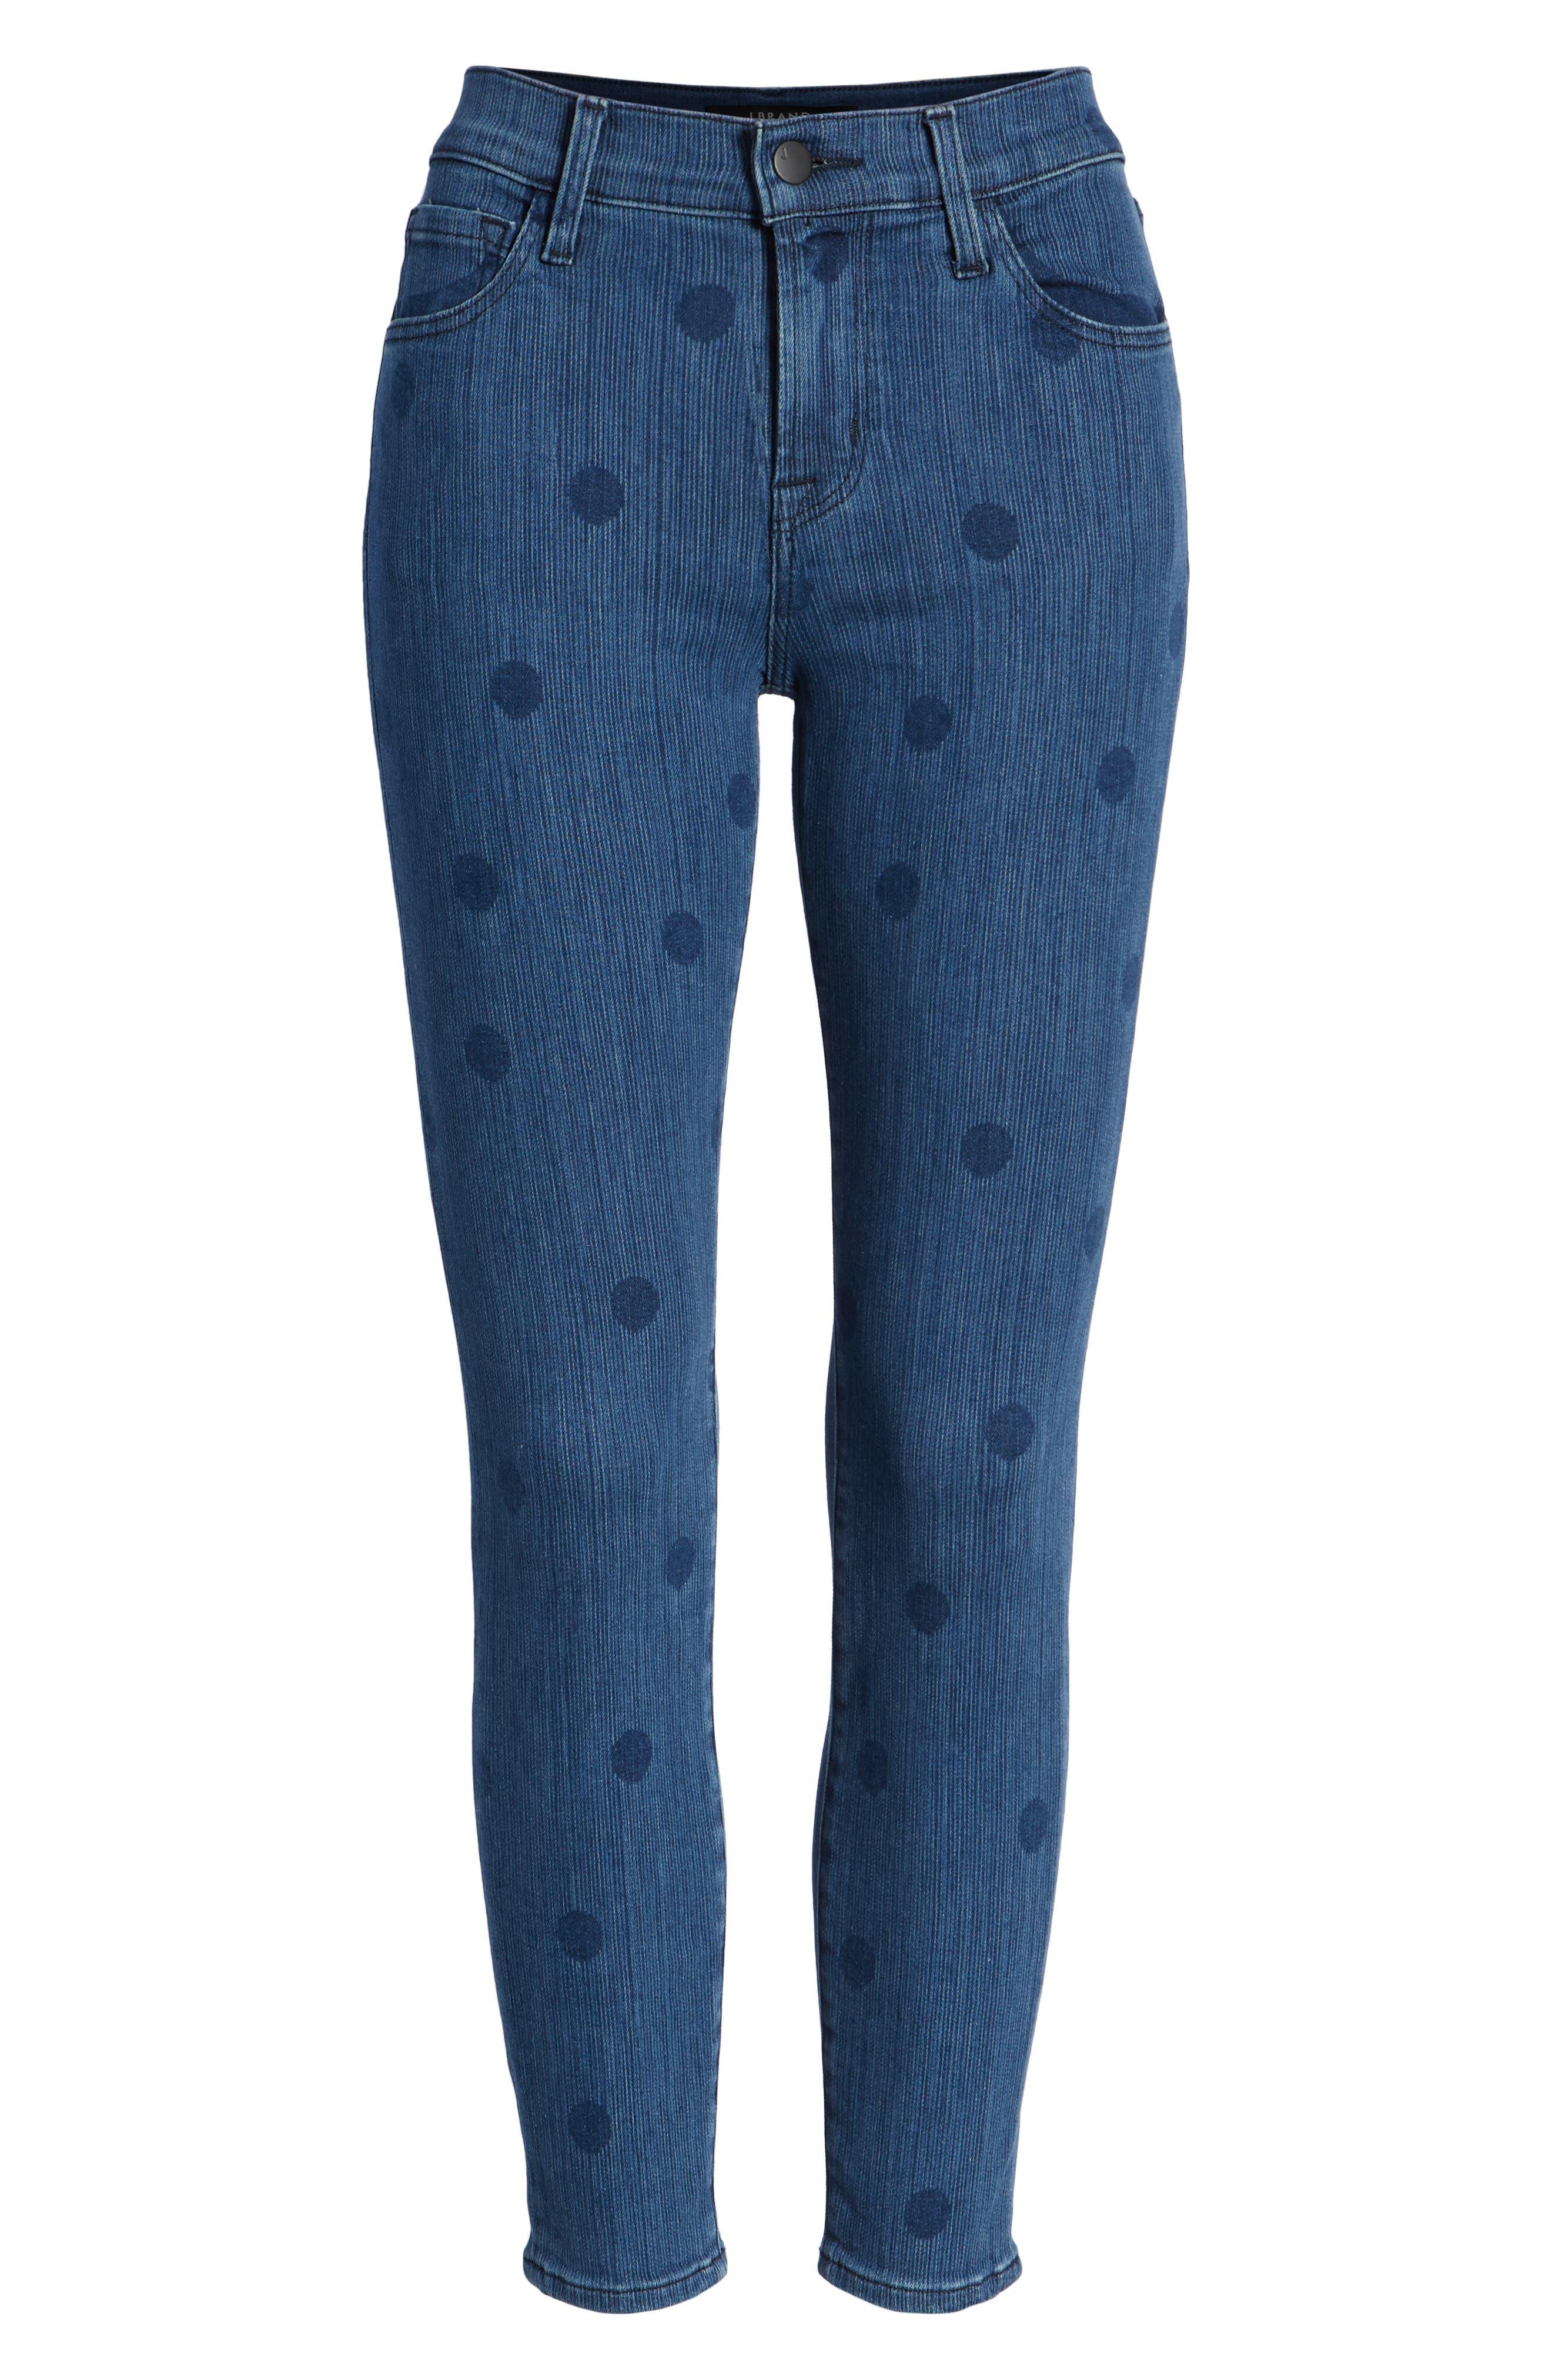 835 Capri Skinny Jeans,                             Alternate thumbnail 7, color,                             400